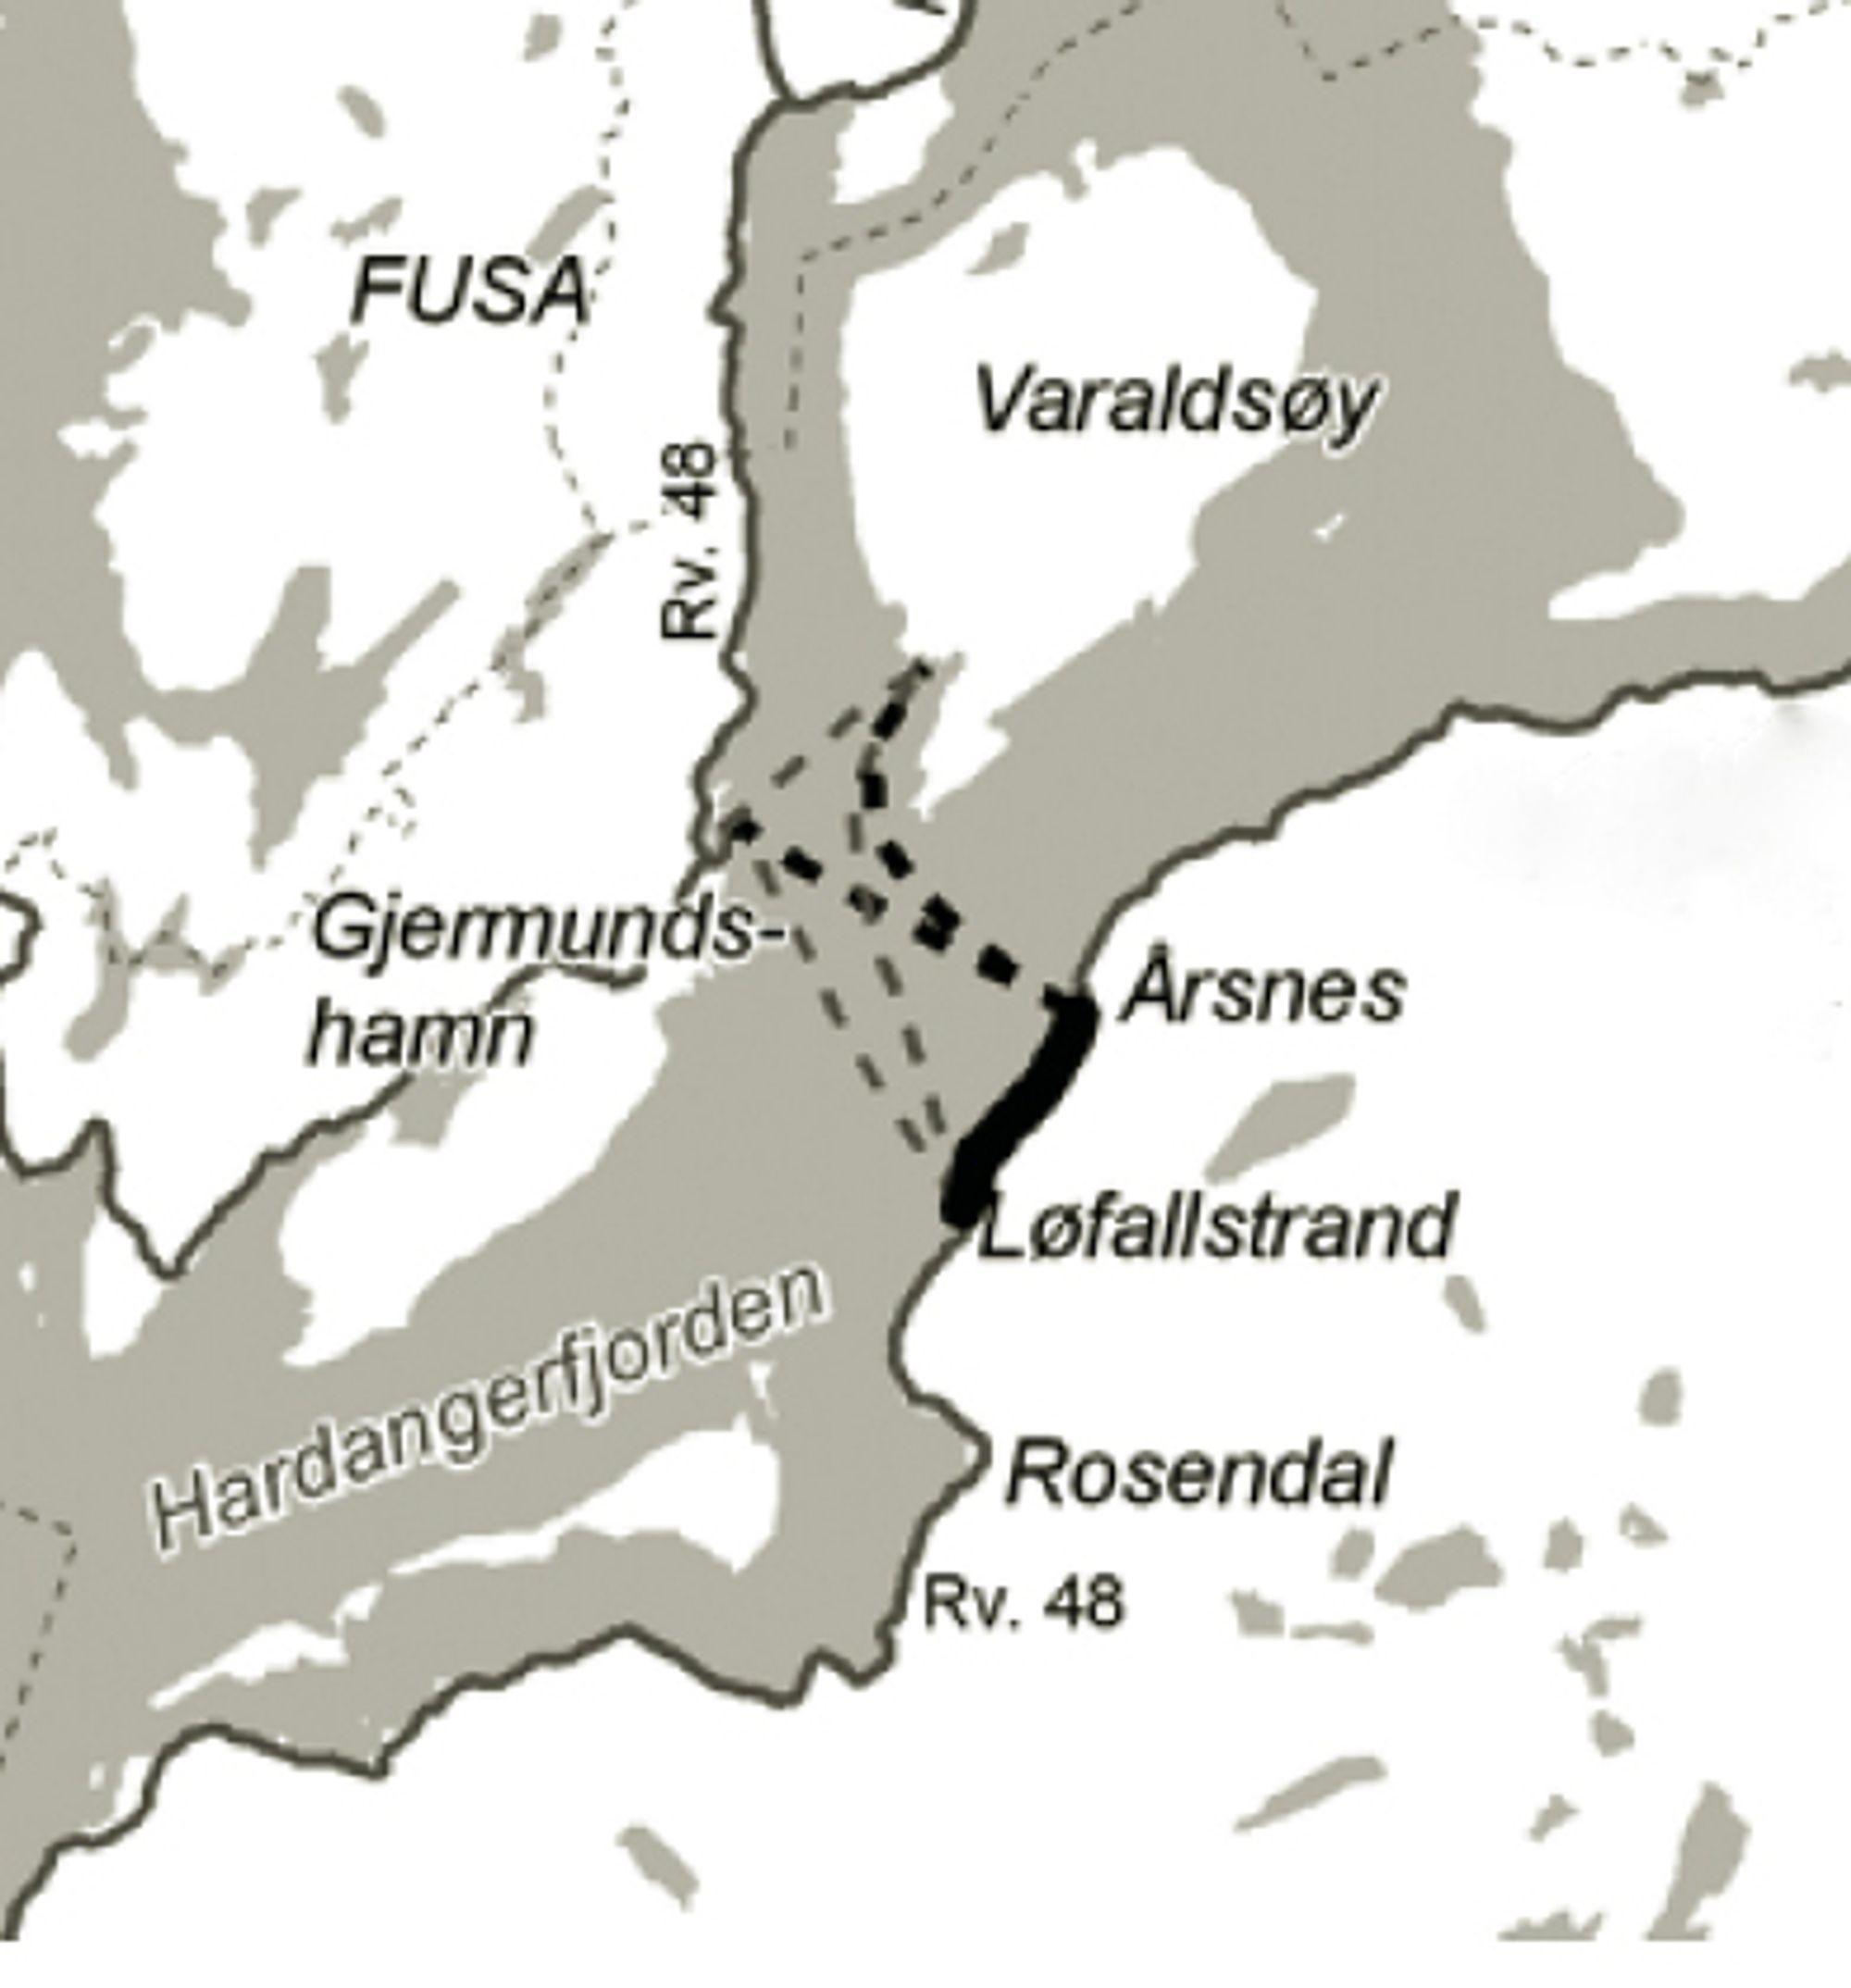 Neste sommer forsvinner trekantsambandet Gjermundshamn-Varaldsøy-Løfallstrand i Kvinnherad kommune. I stedet kommer sambandet Gjermundshamn-Varaldsøy-Årsnes.